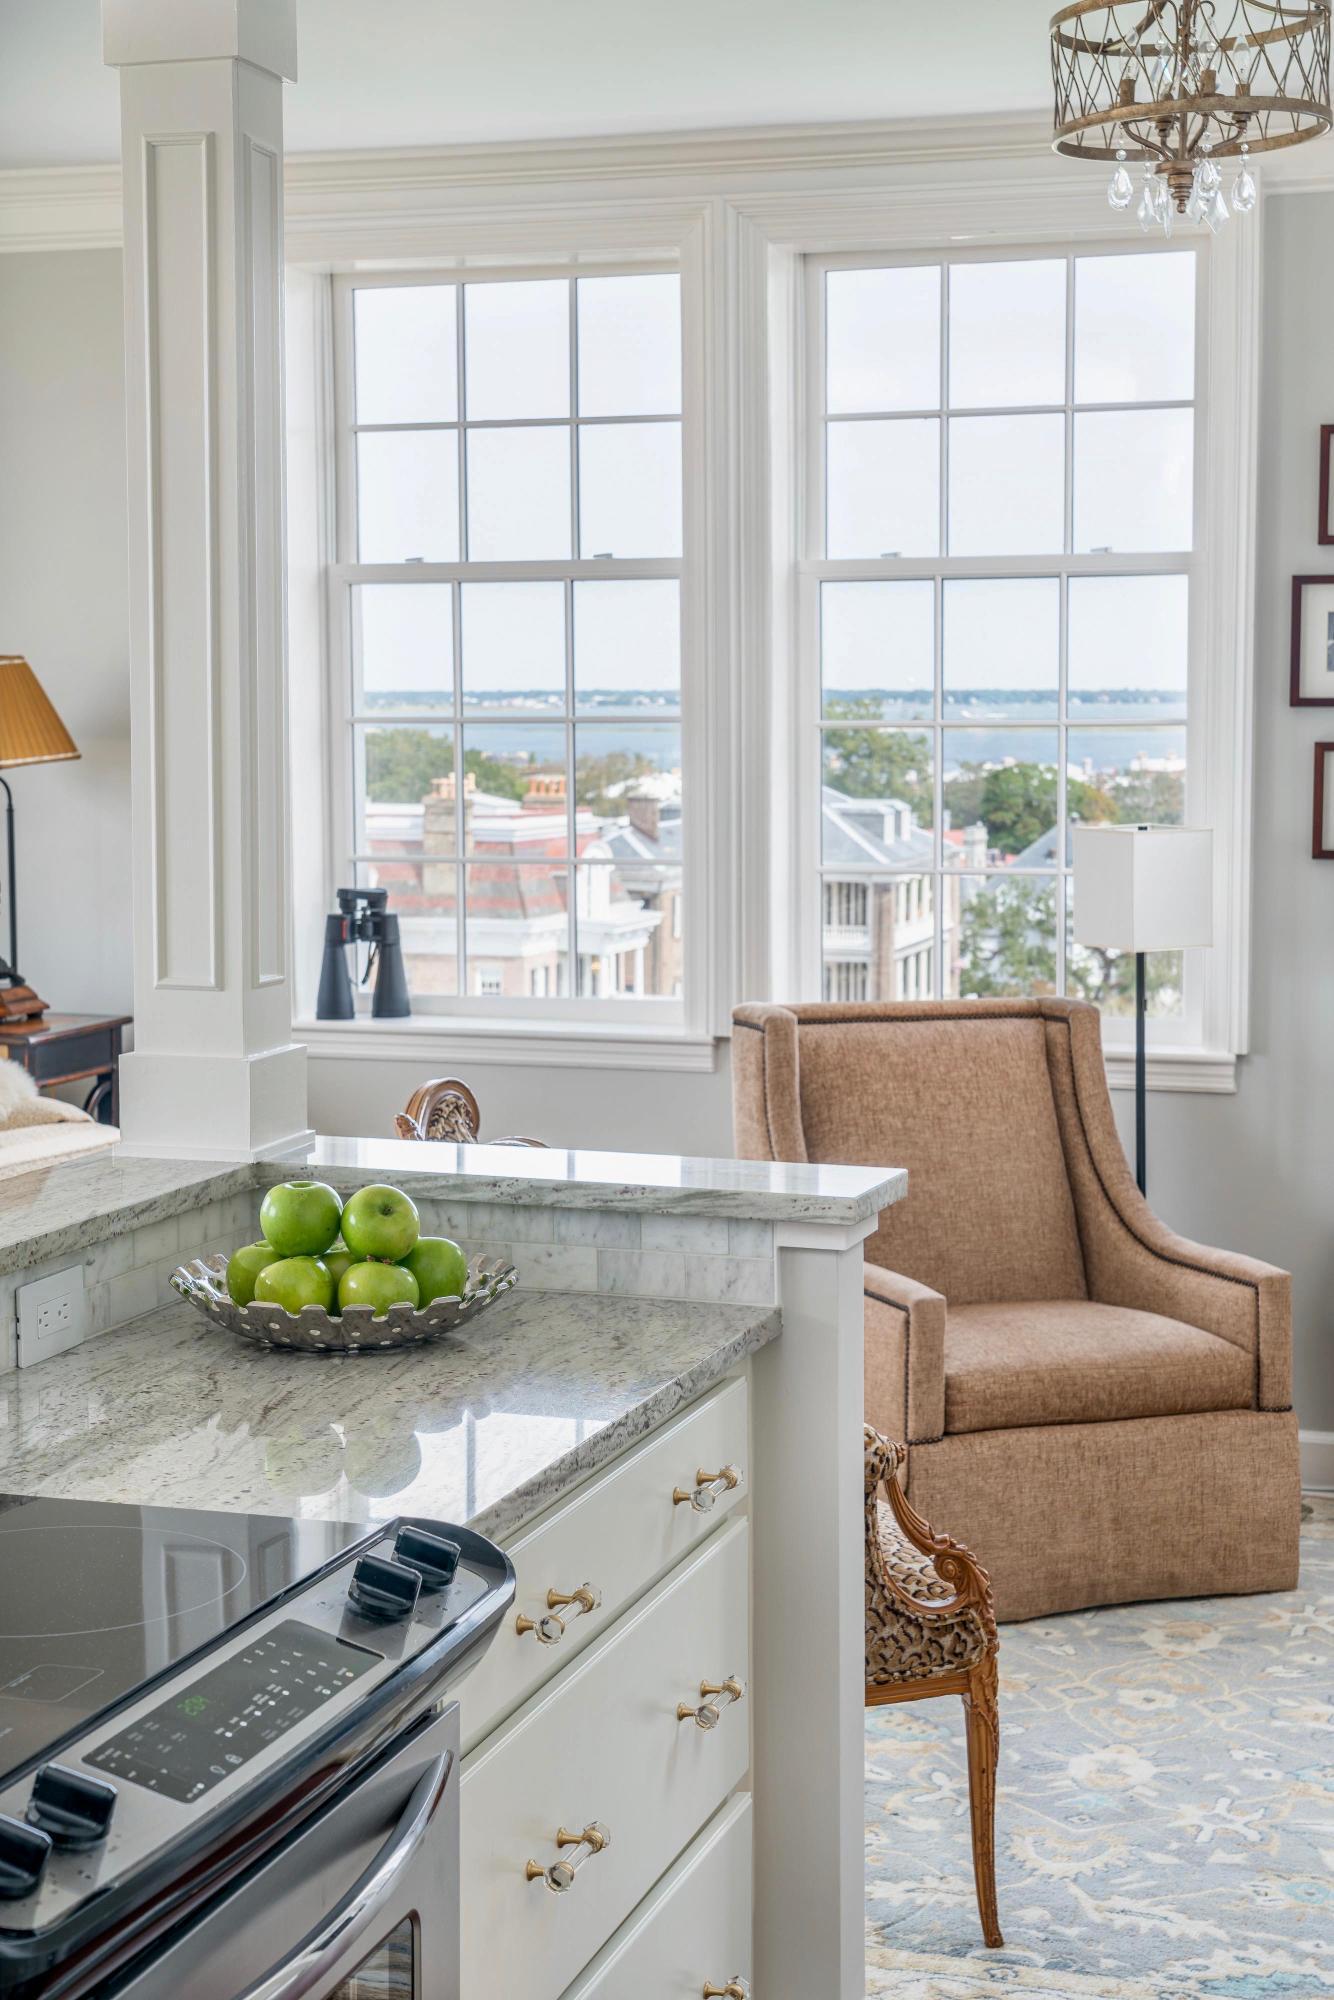 Fort Sumter House Homes For Sale - 1 King, Charleston, SC - 2